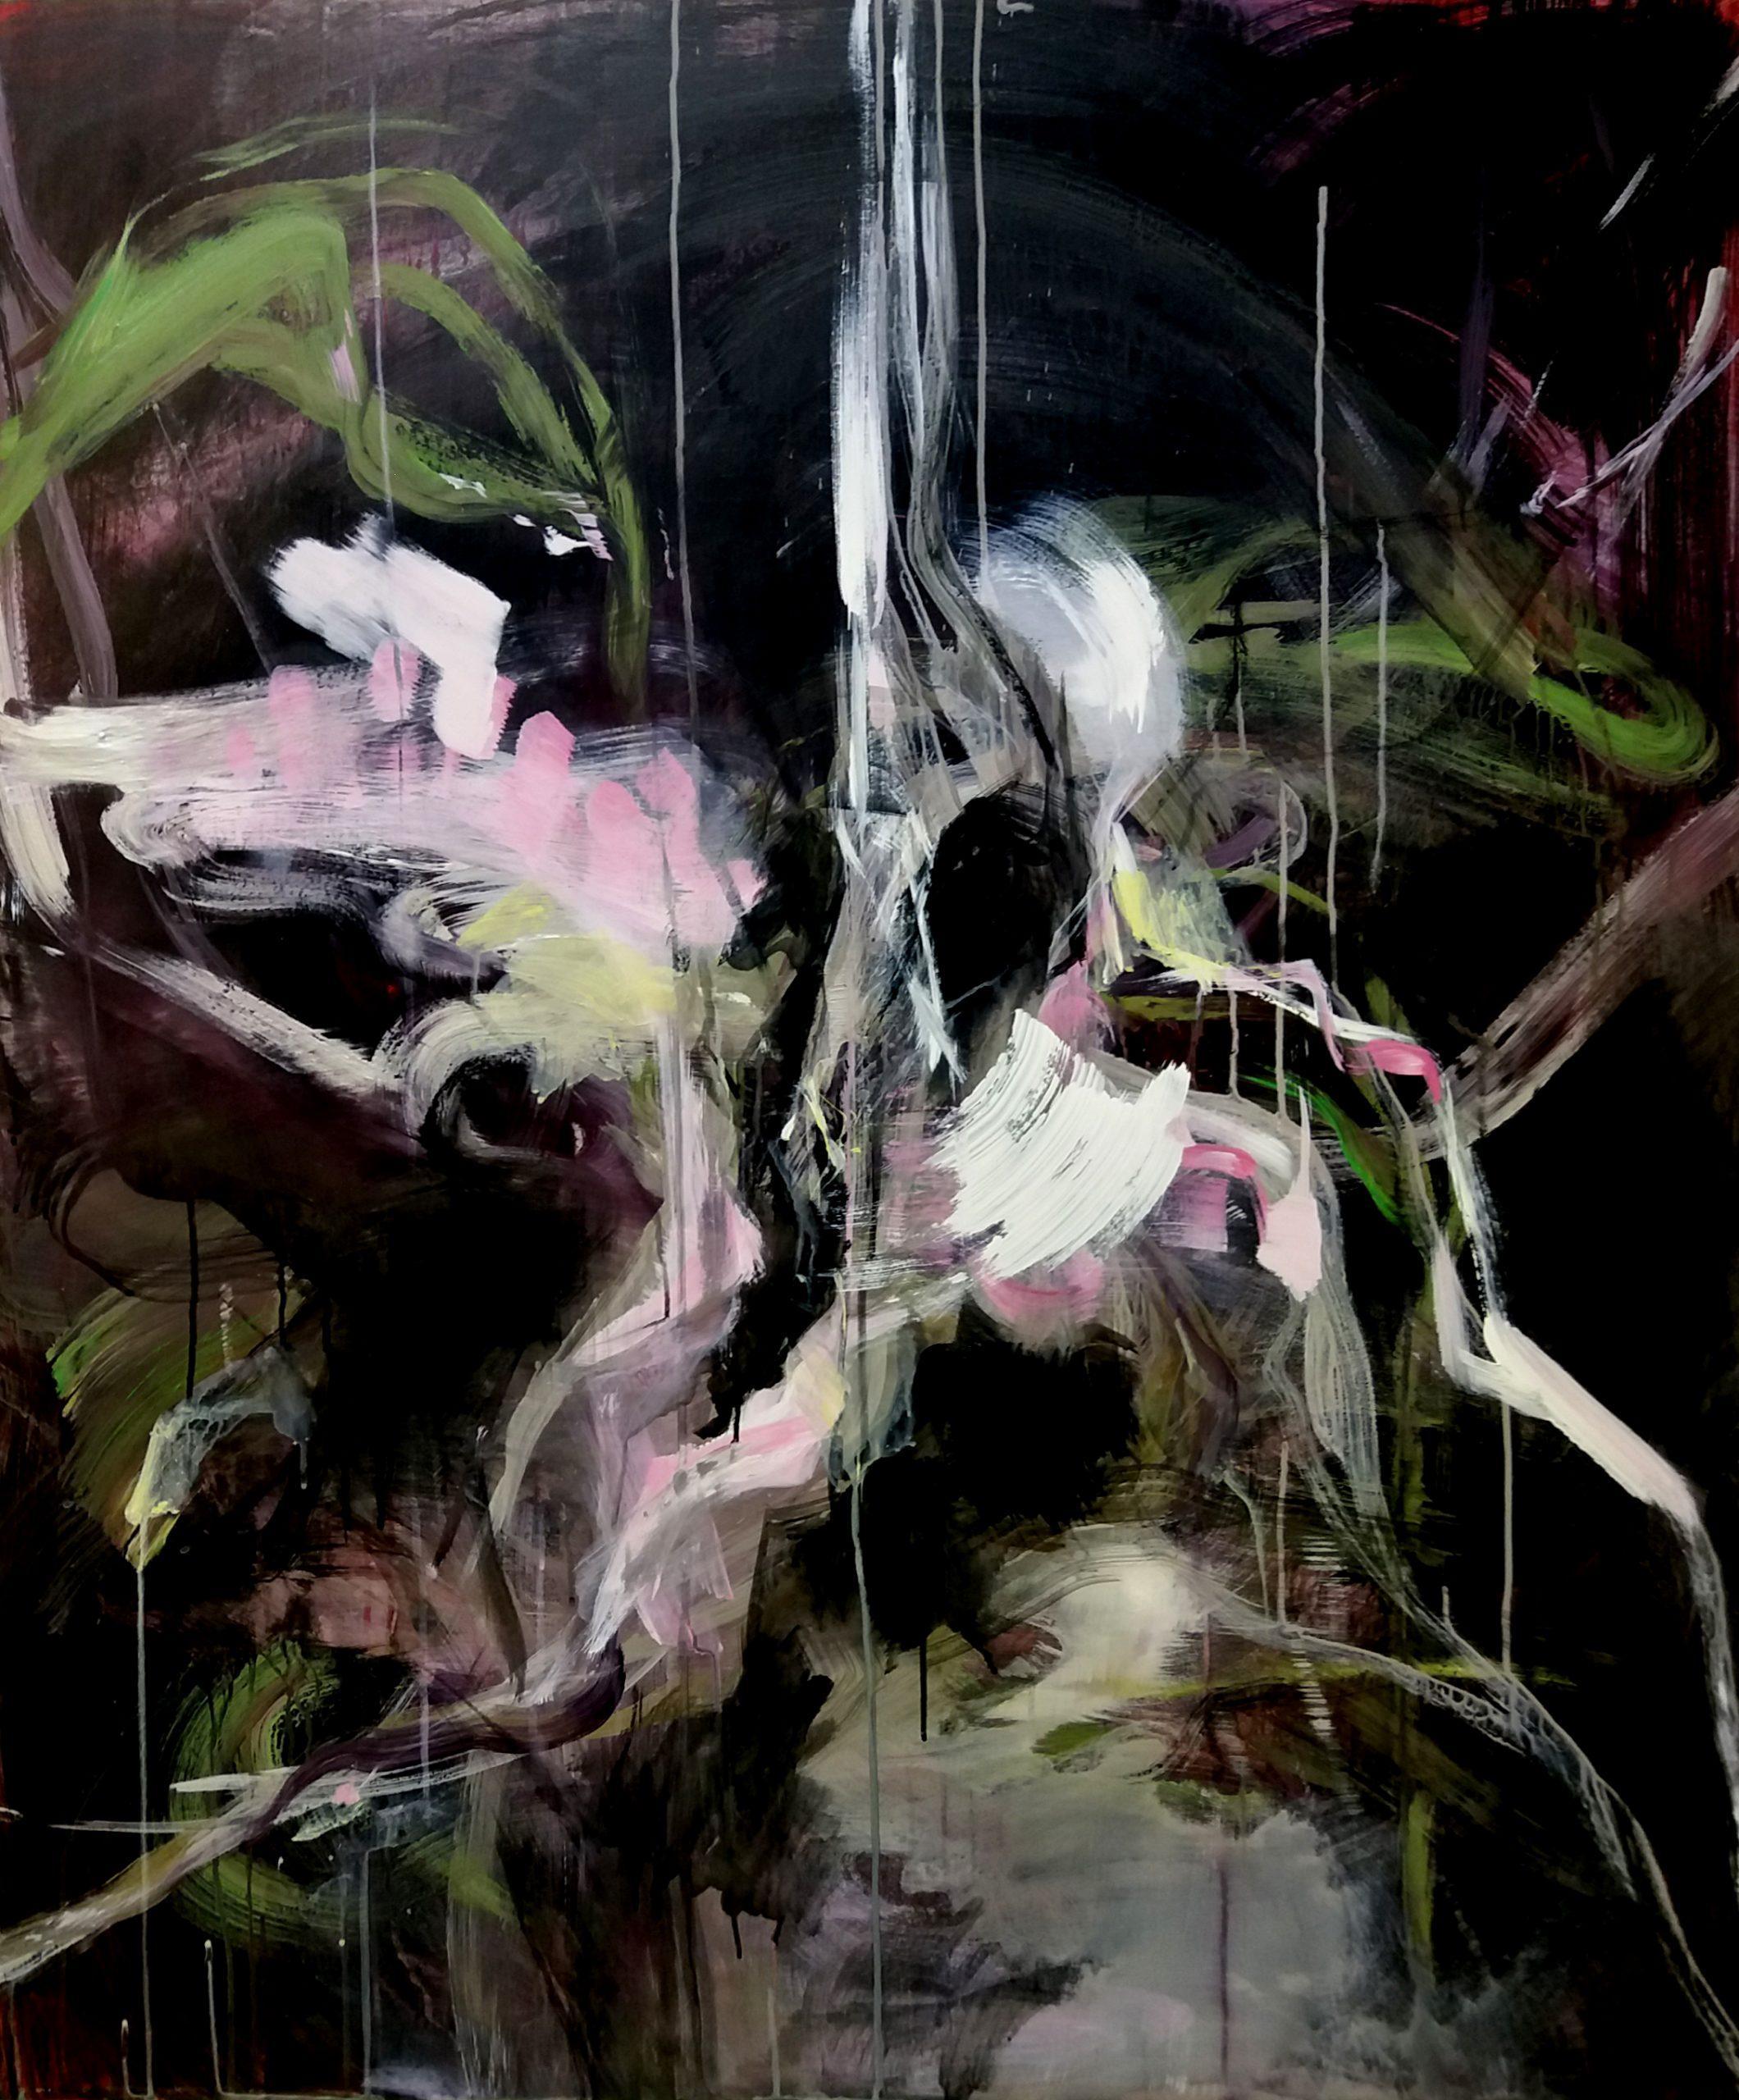 "Mansikka Anni,""Yöjuoksu"", 100x120cm, akryyli mdf-levylle, 2018"